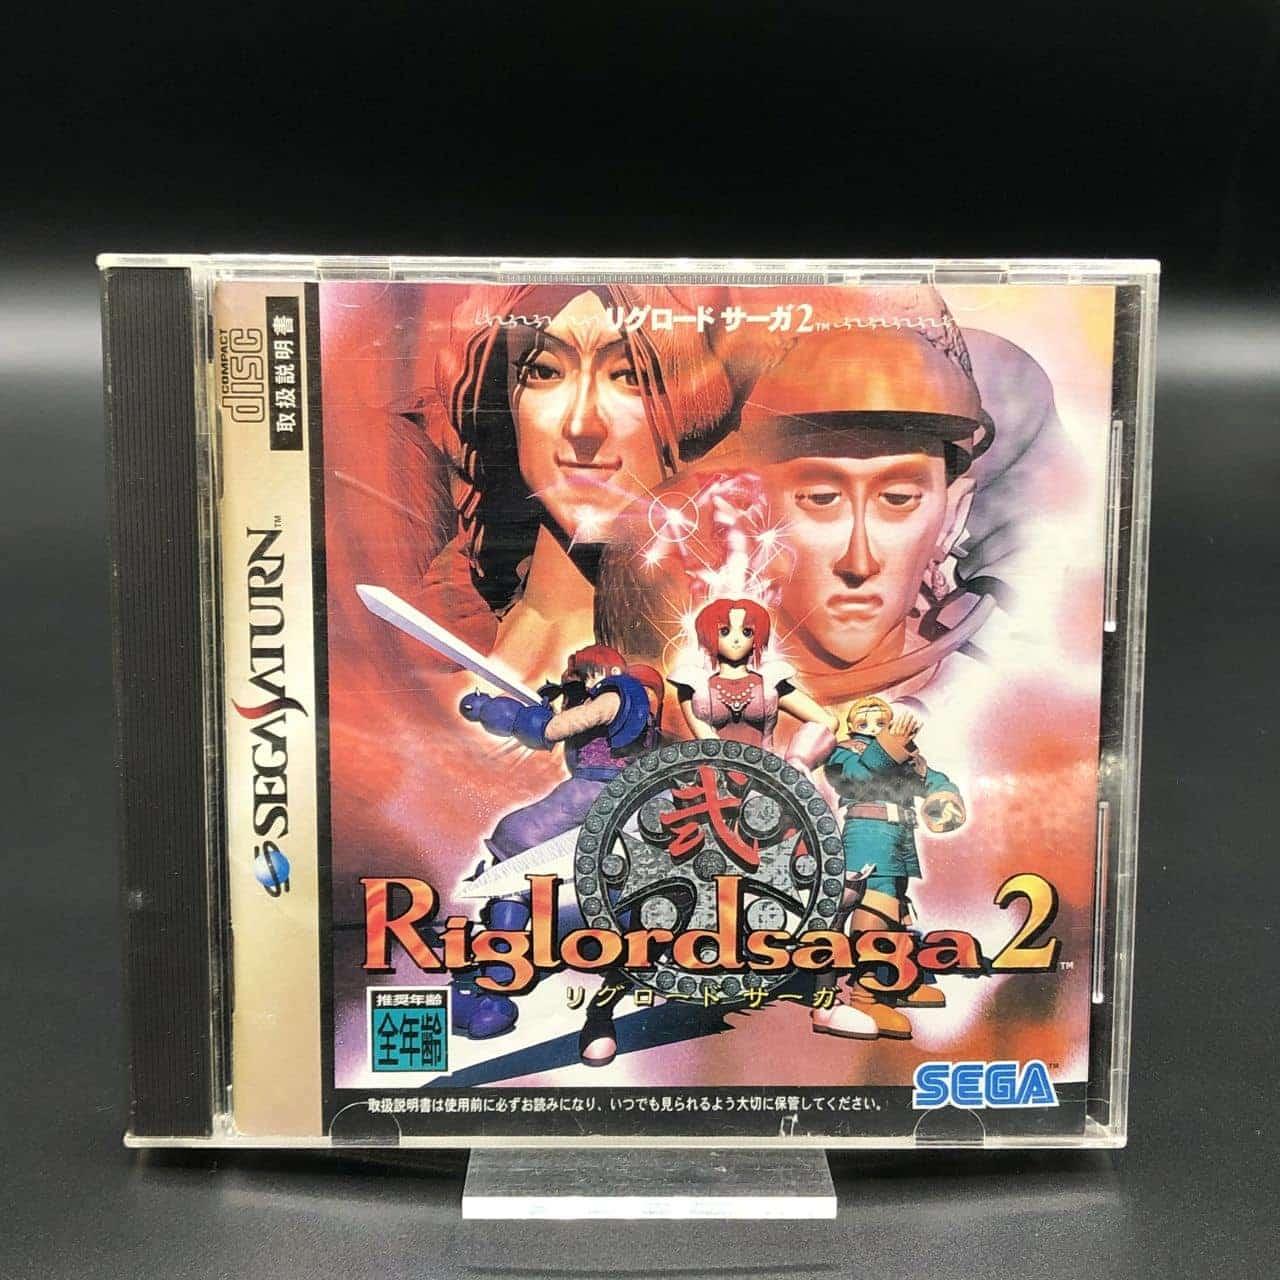 Riglordsaga 2 (Import Japan) (Komplett) (Gut) Sega Saturn